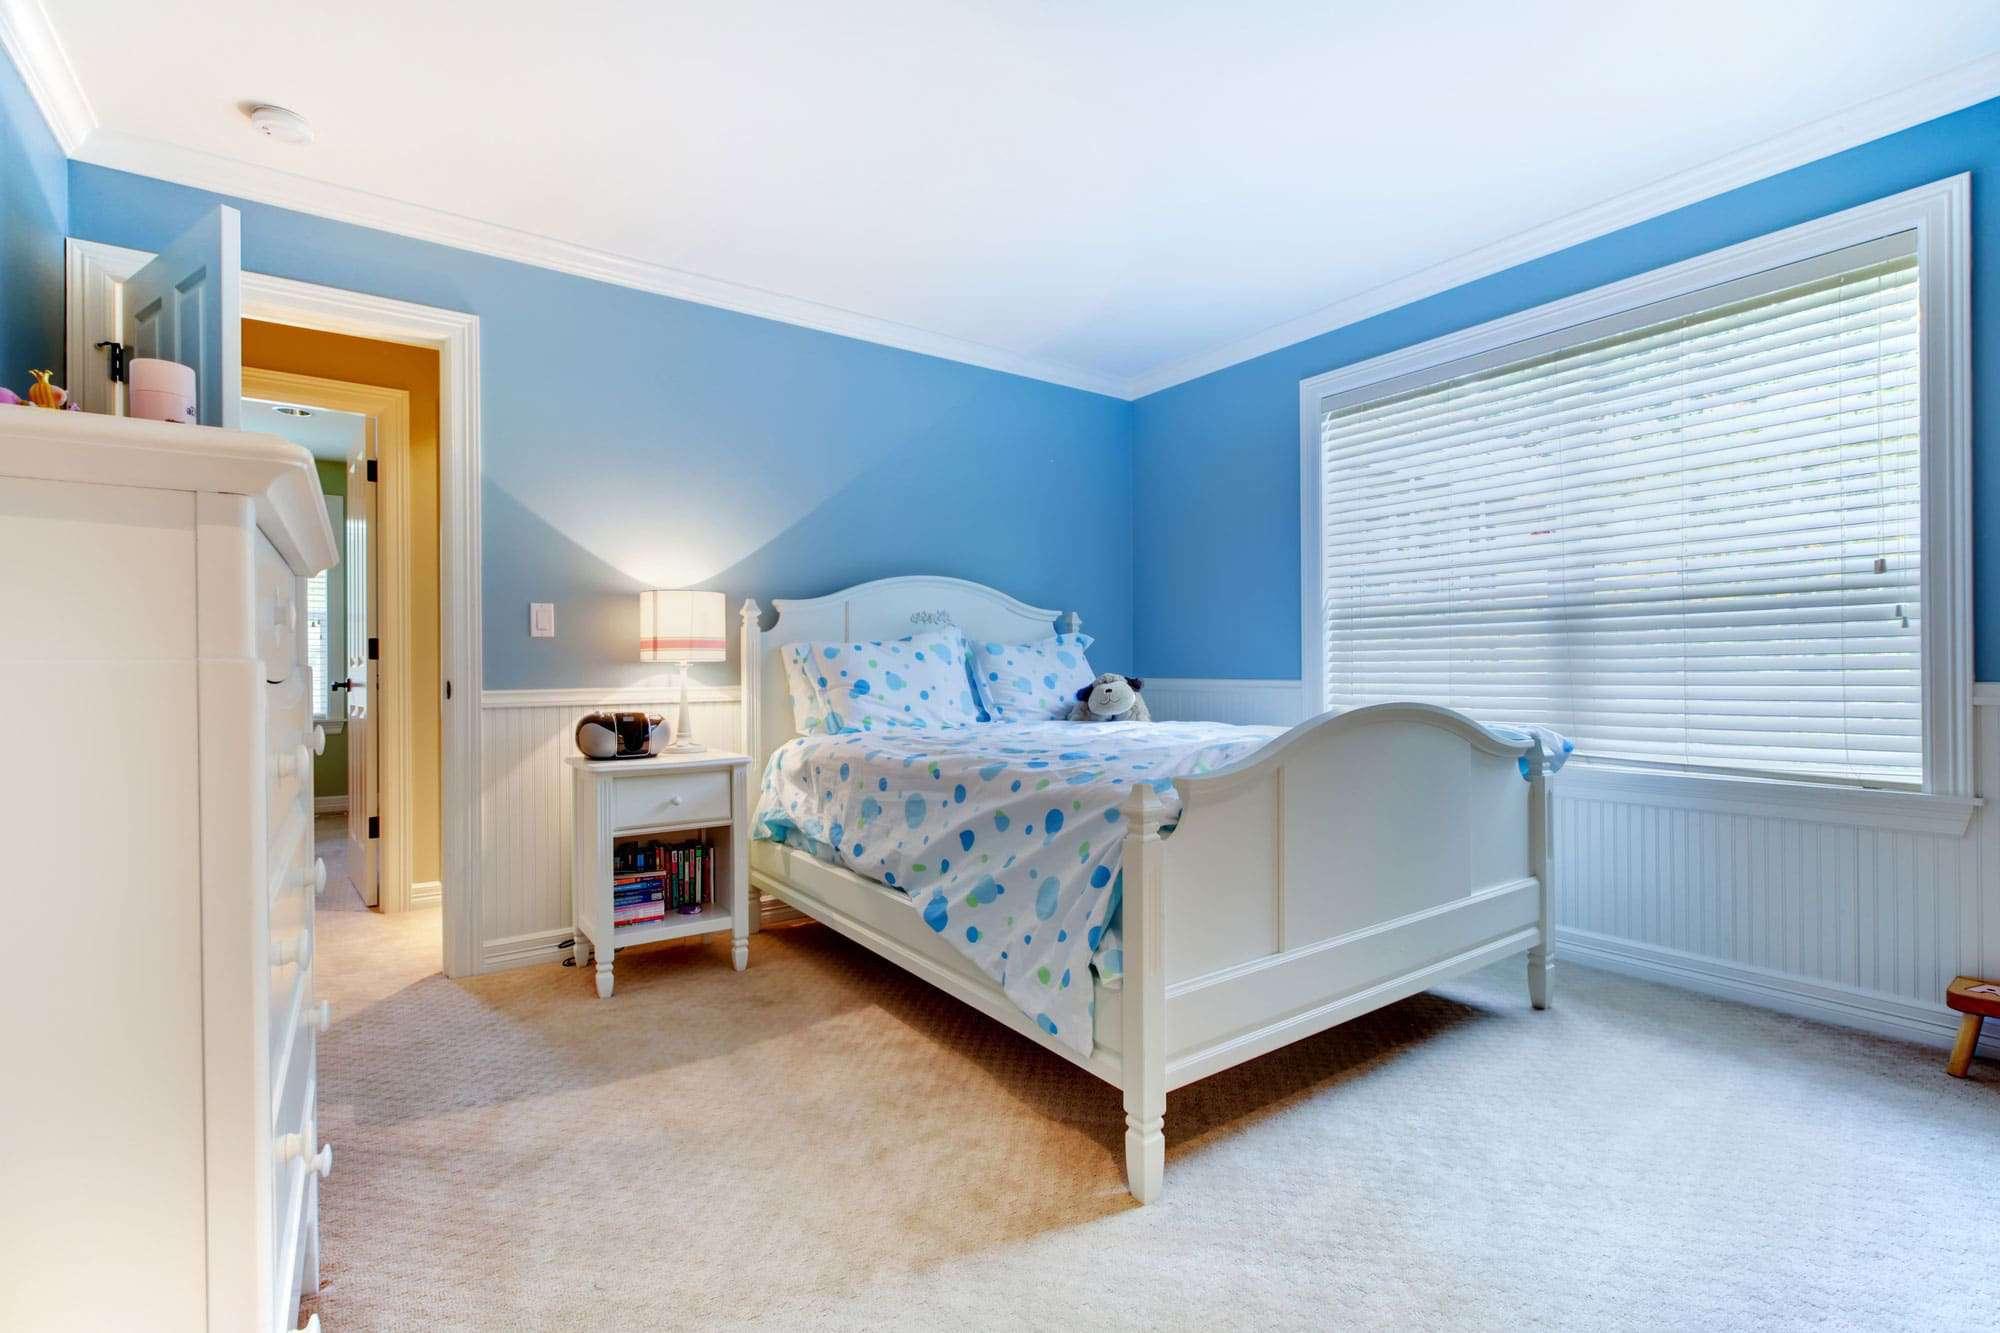 Blue girls kids bedroom interior clean carpet.